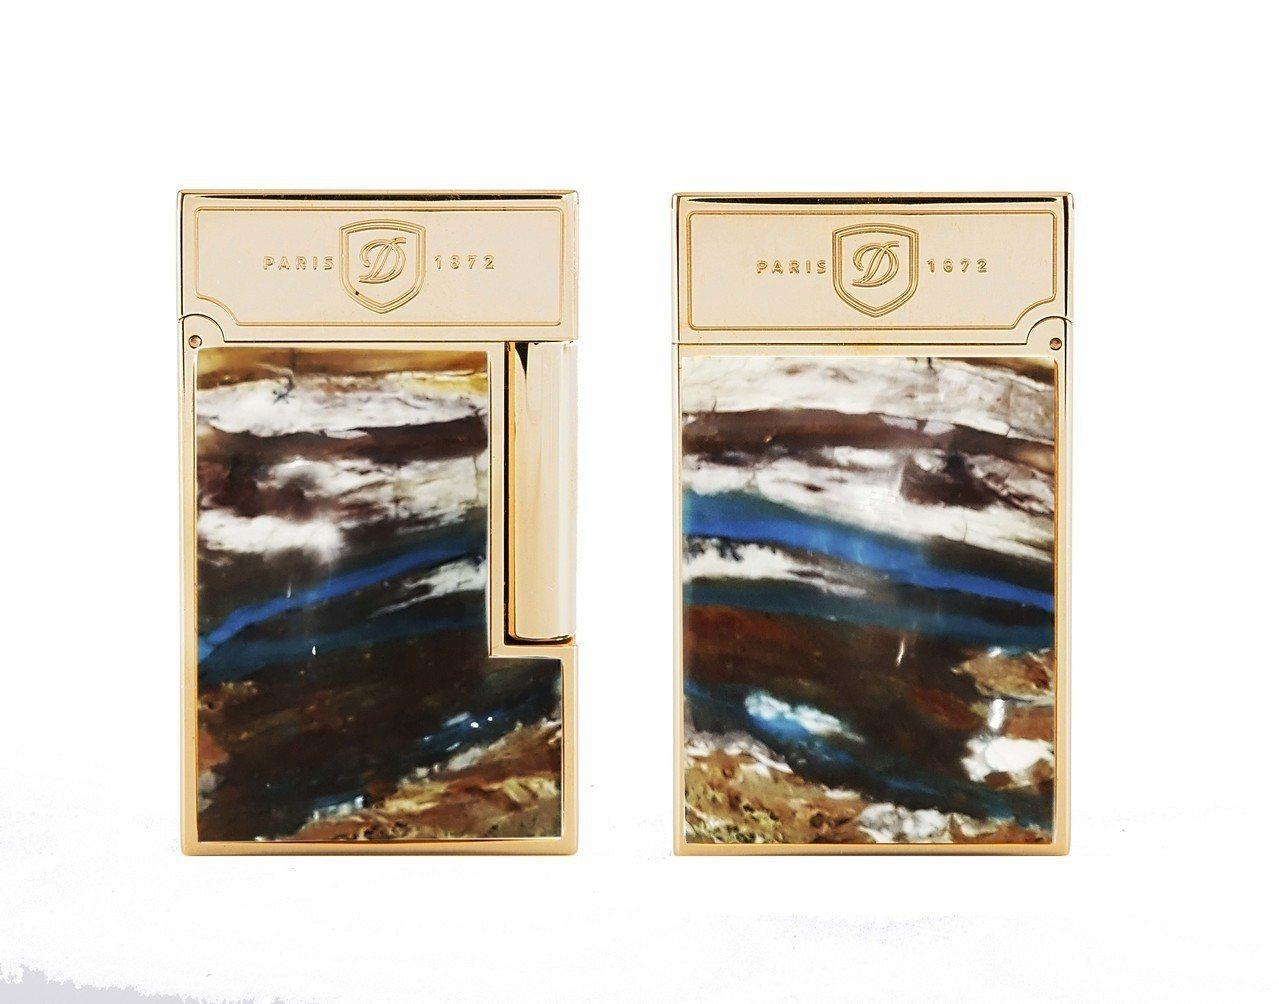 S.T. Dupont寶石打火機蛋白石款,限量288件,20萬8,000元。圖/...